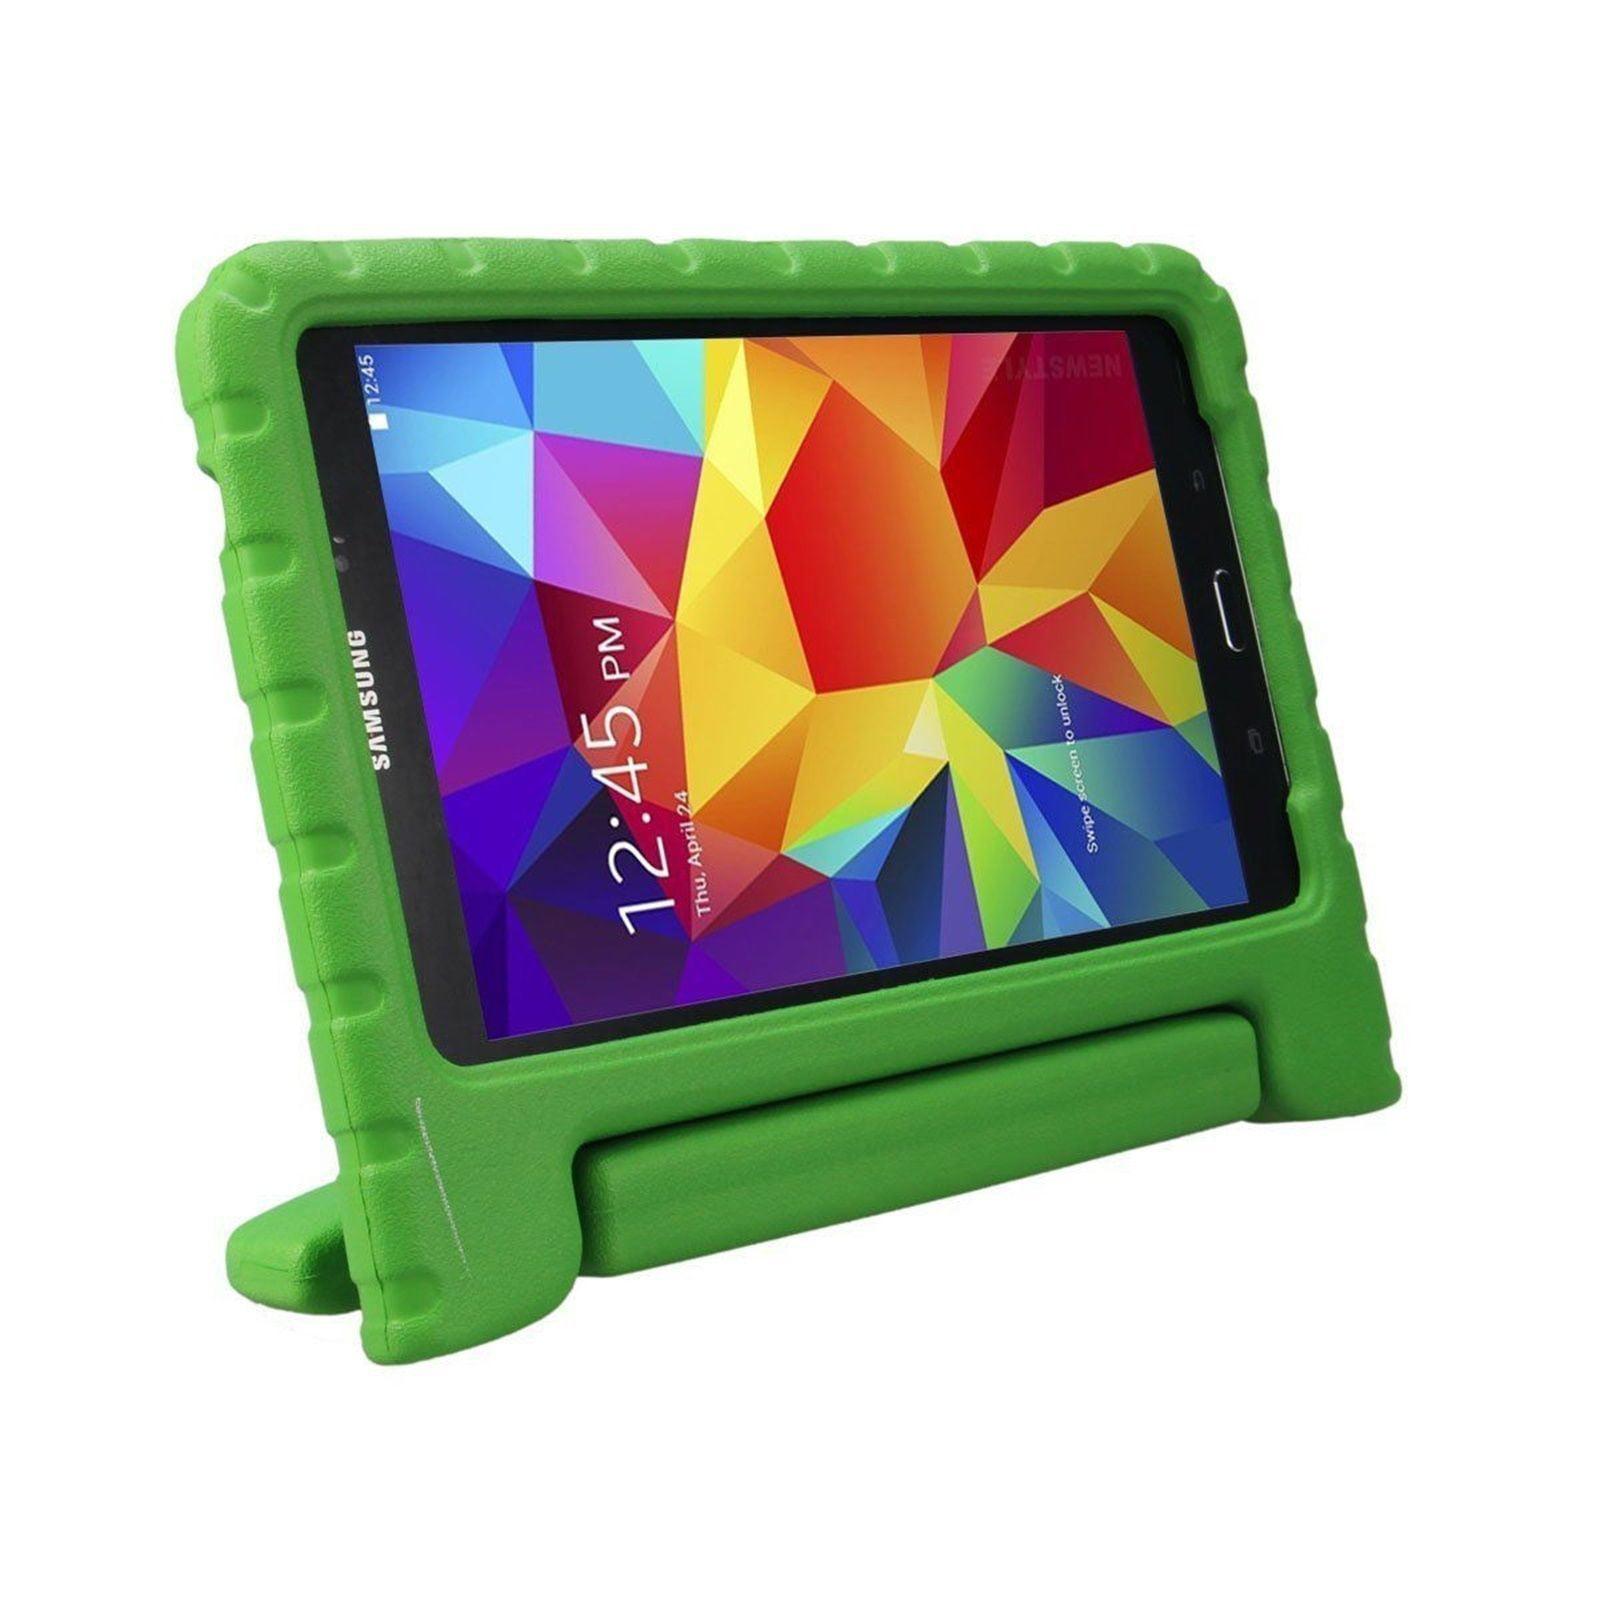 Galaxy Tab E 8.0 T377 Kids Case by KIQ Child-Friendly Fun Kiddie Tablet Cover EVA Foam For Samsung Galaxy Tab E 8 inch SM-T377 (Green)